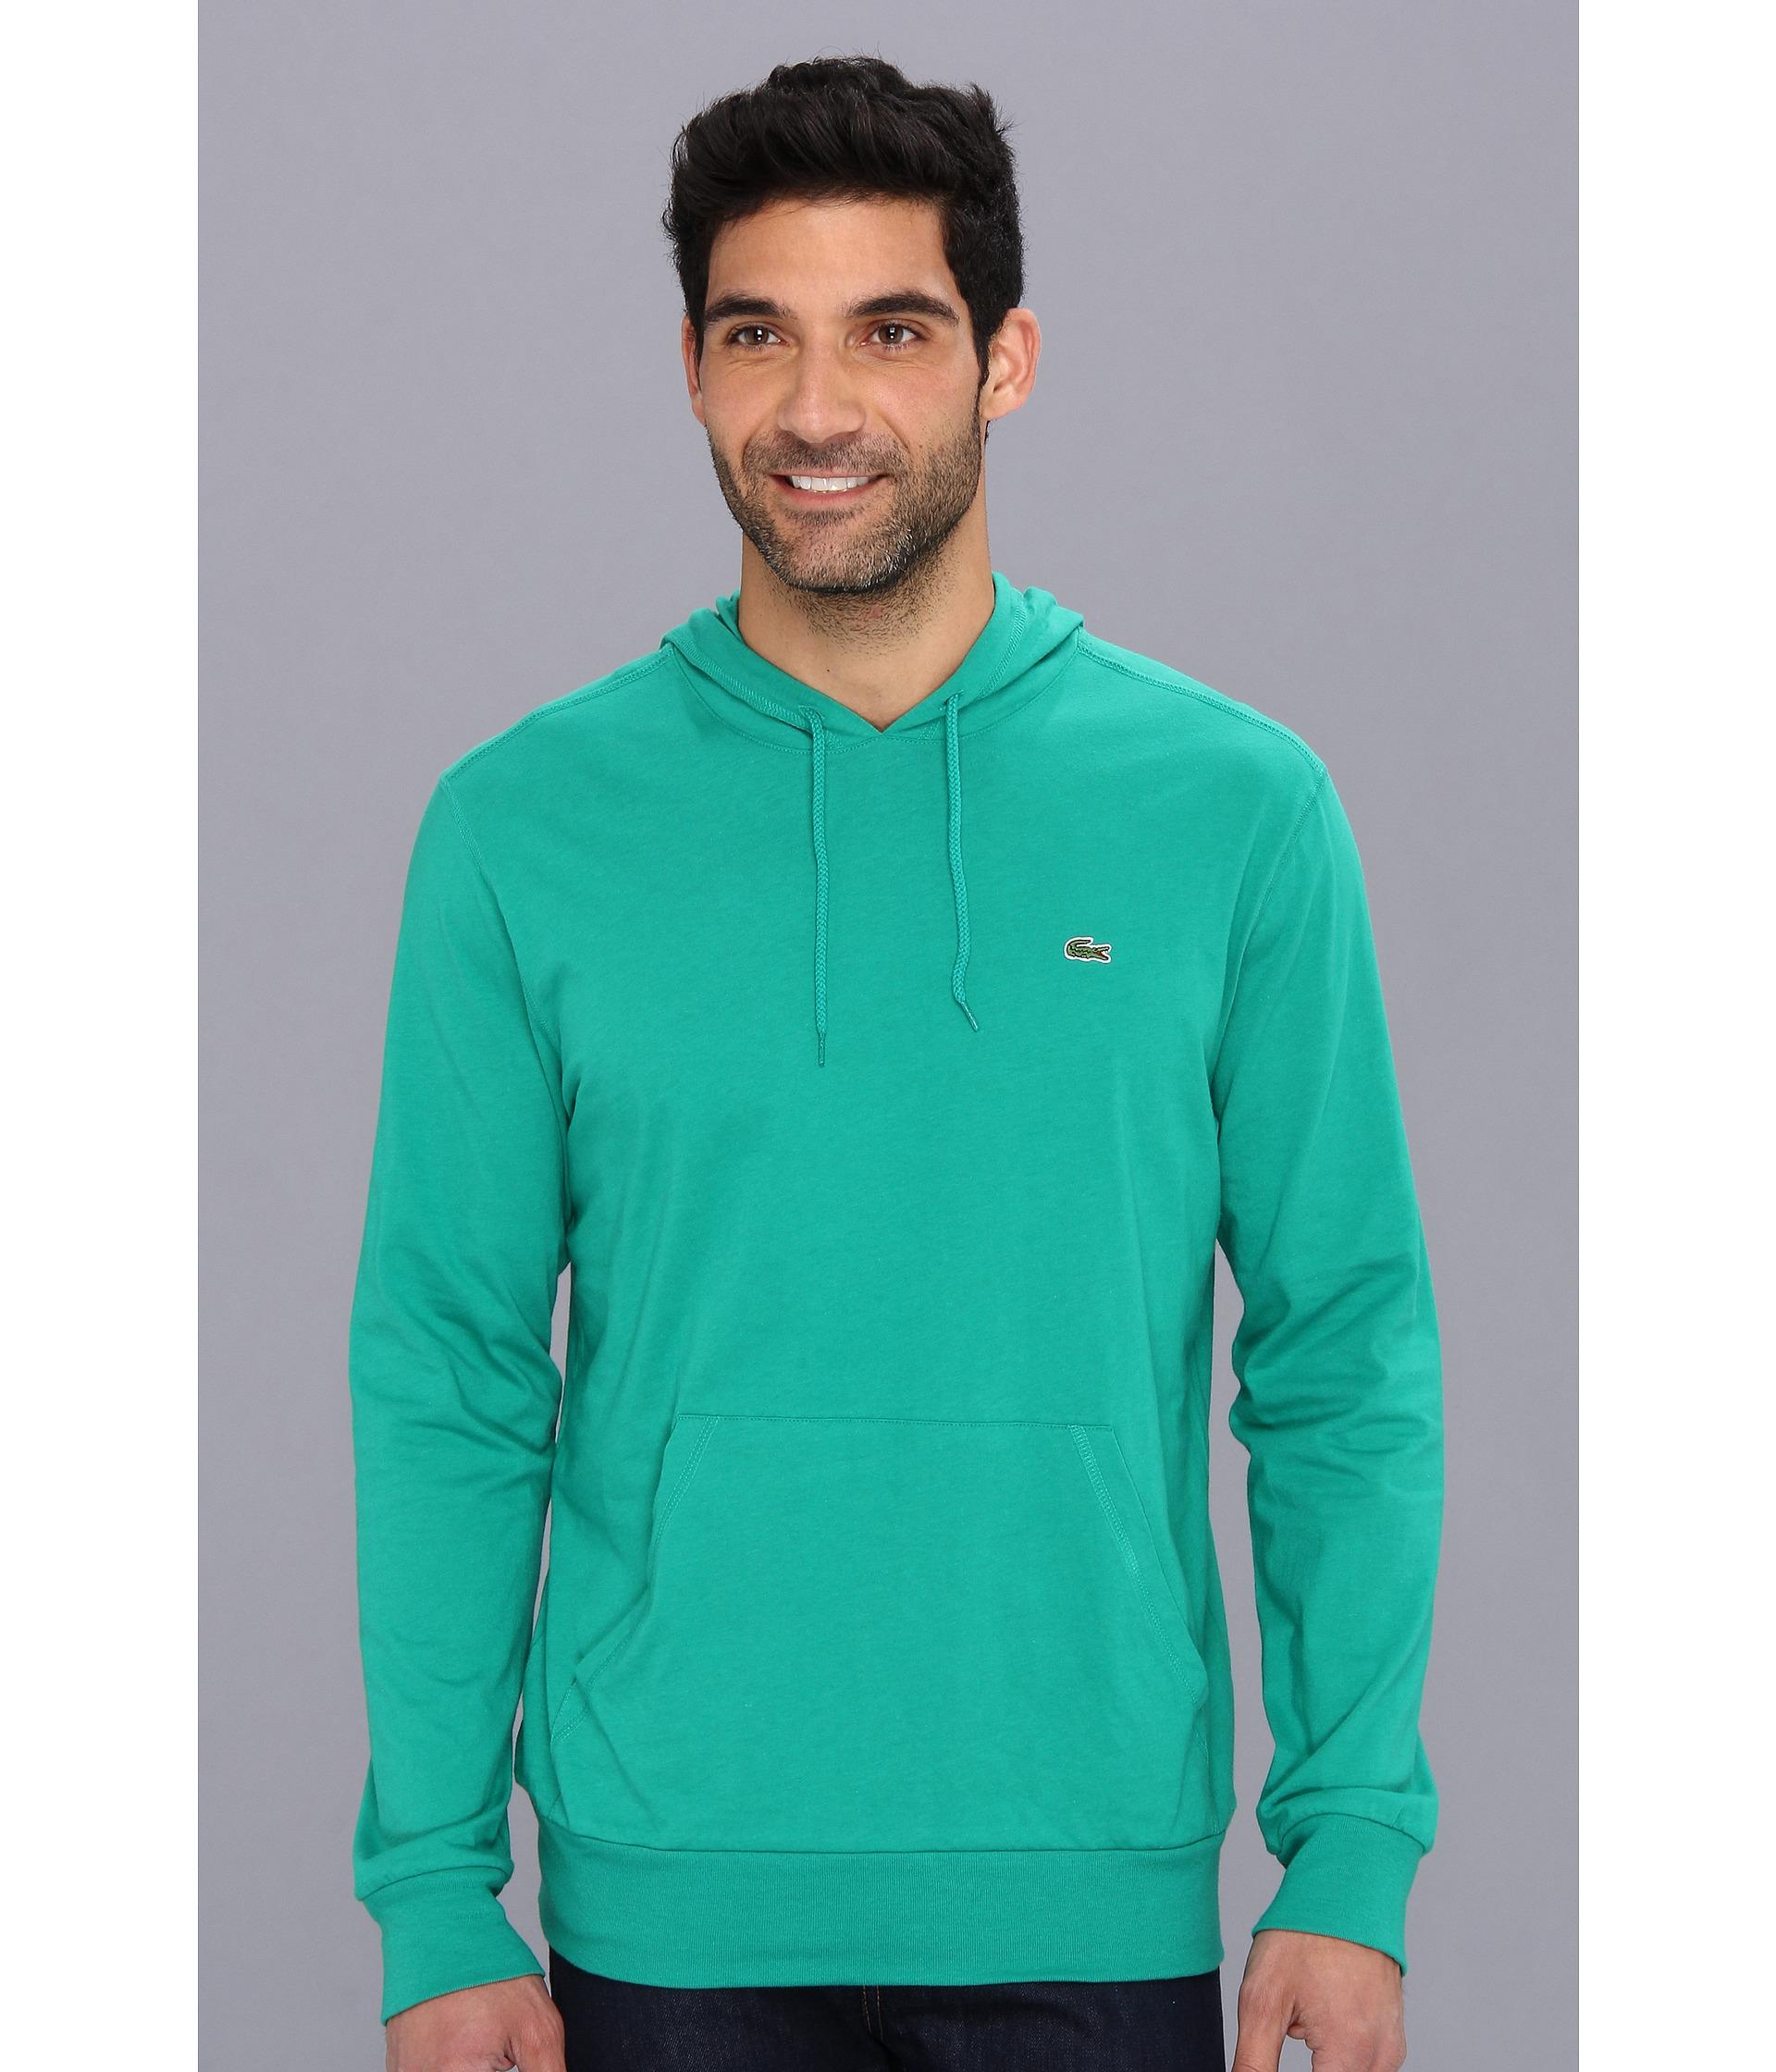 lacoste jersey tshirt hoodie in green for men lyst